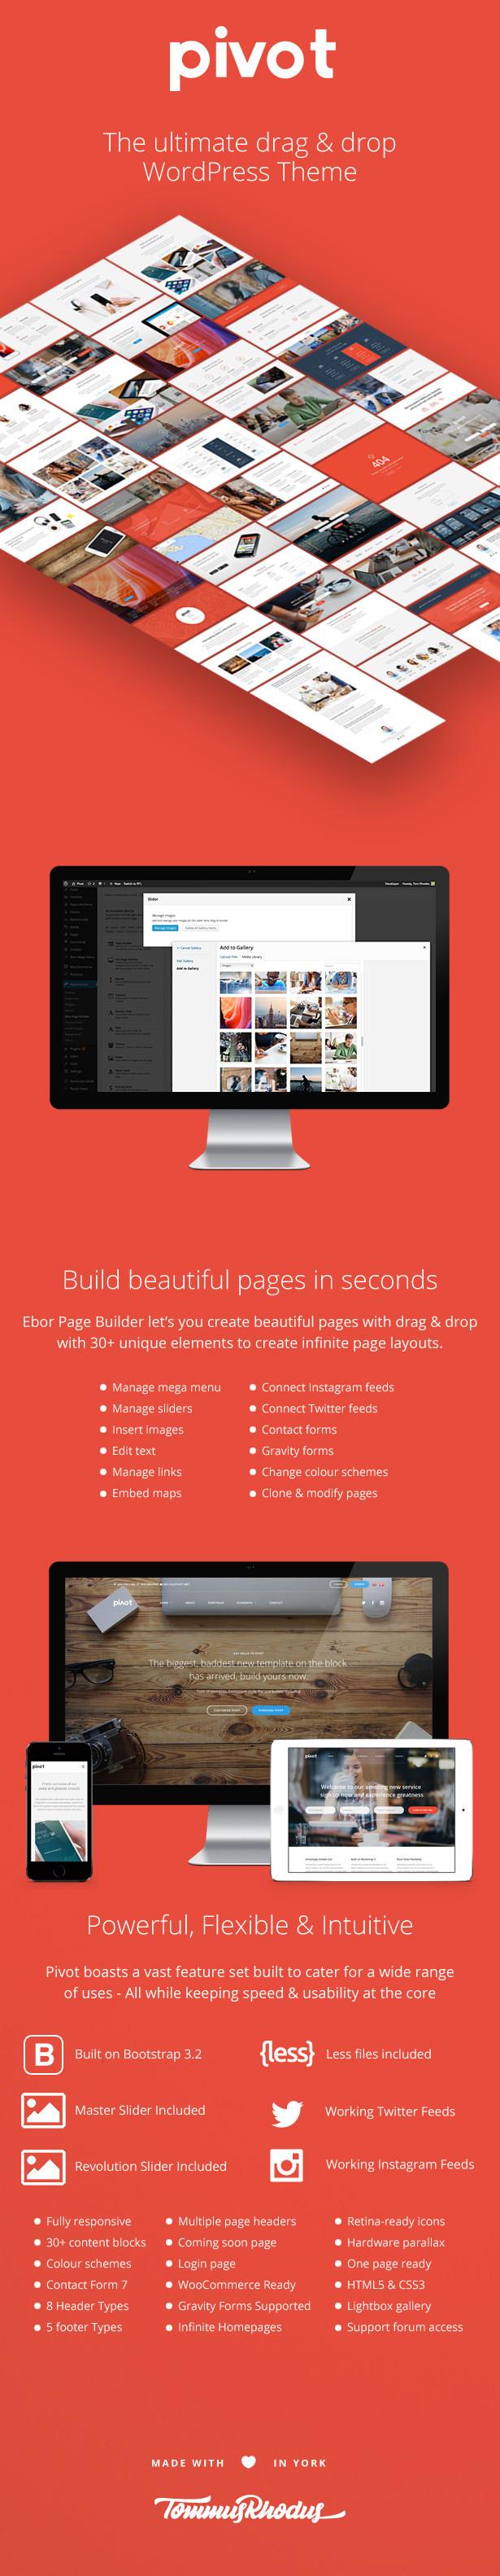 pivot4 - Pivot | Responsive Multipurpose WordPress Theme